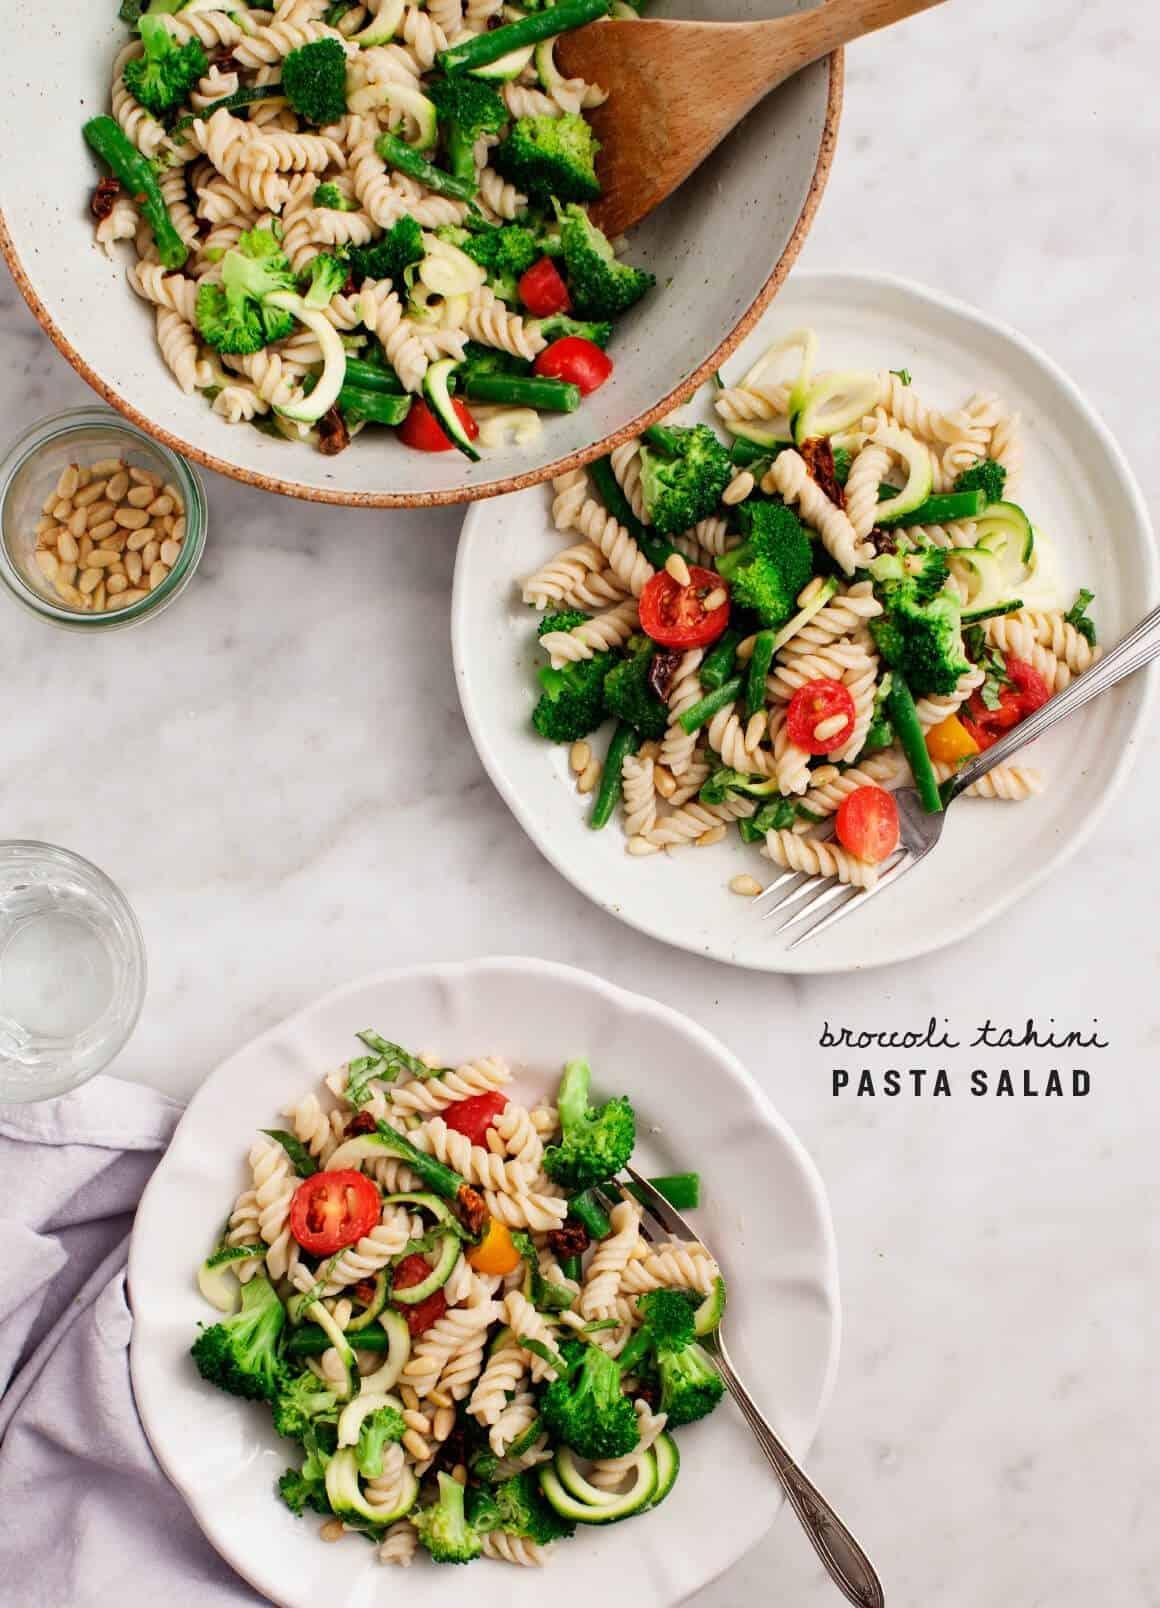 Pasta salad recipe tomatoes broccoli